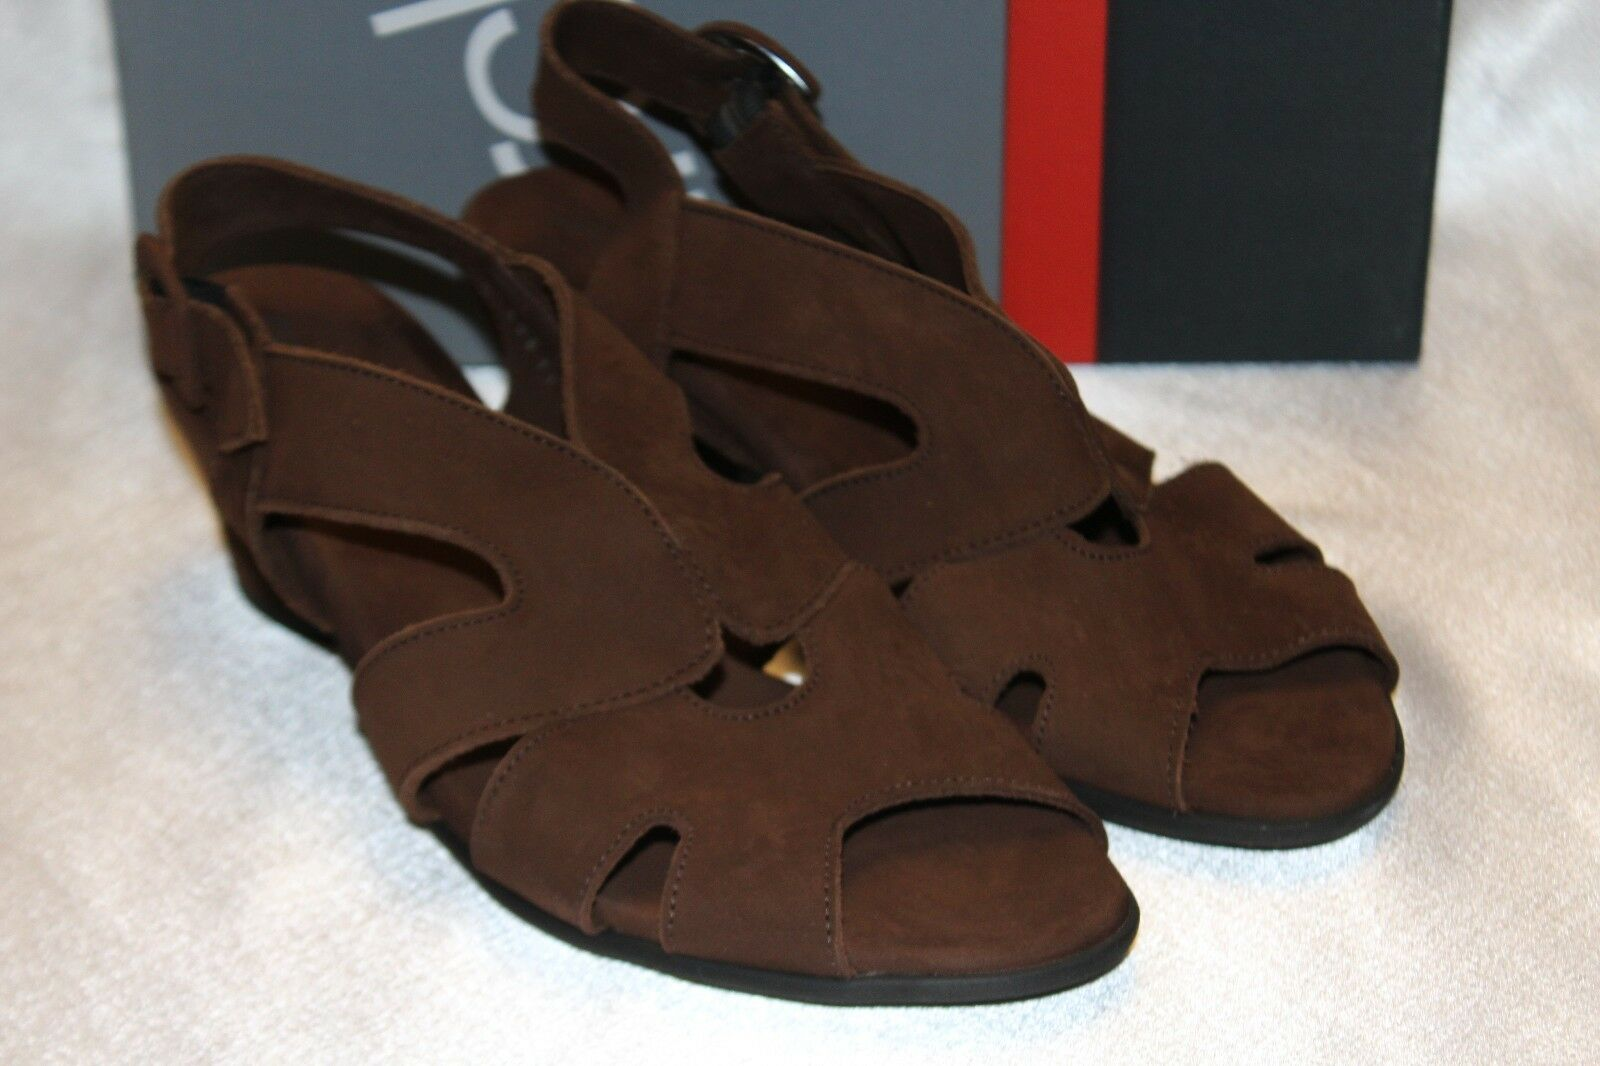 NEW NIB ARCHE Brown Nubuck Suede MOLYKI Heeled Sandals MADE IN FRANCE Sz 10  365